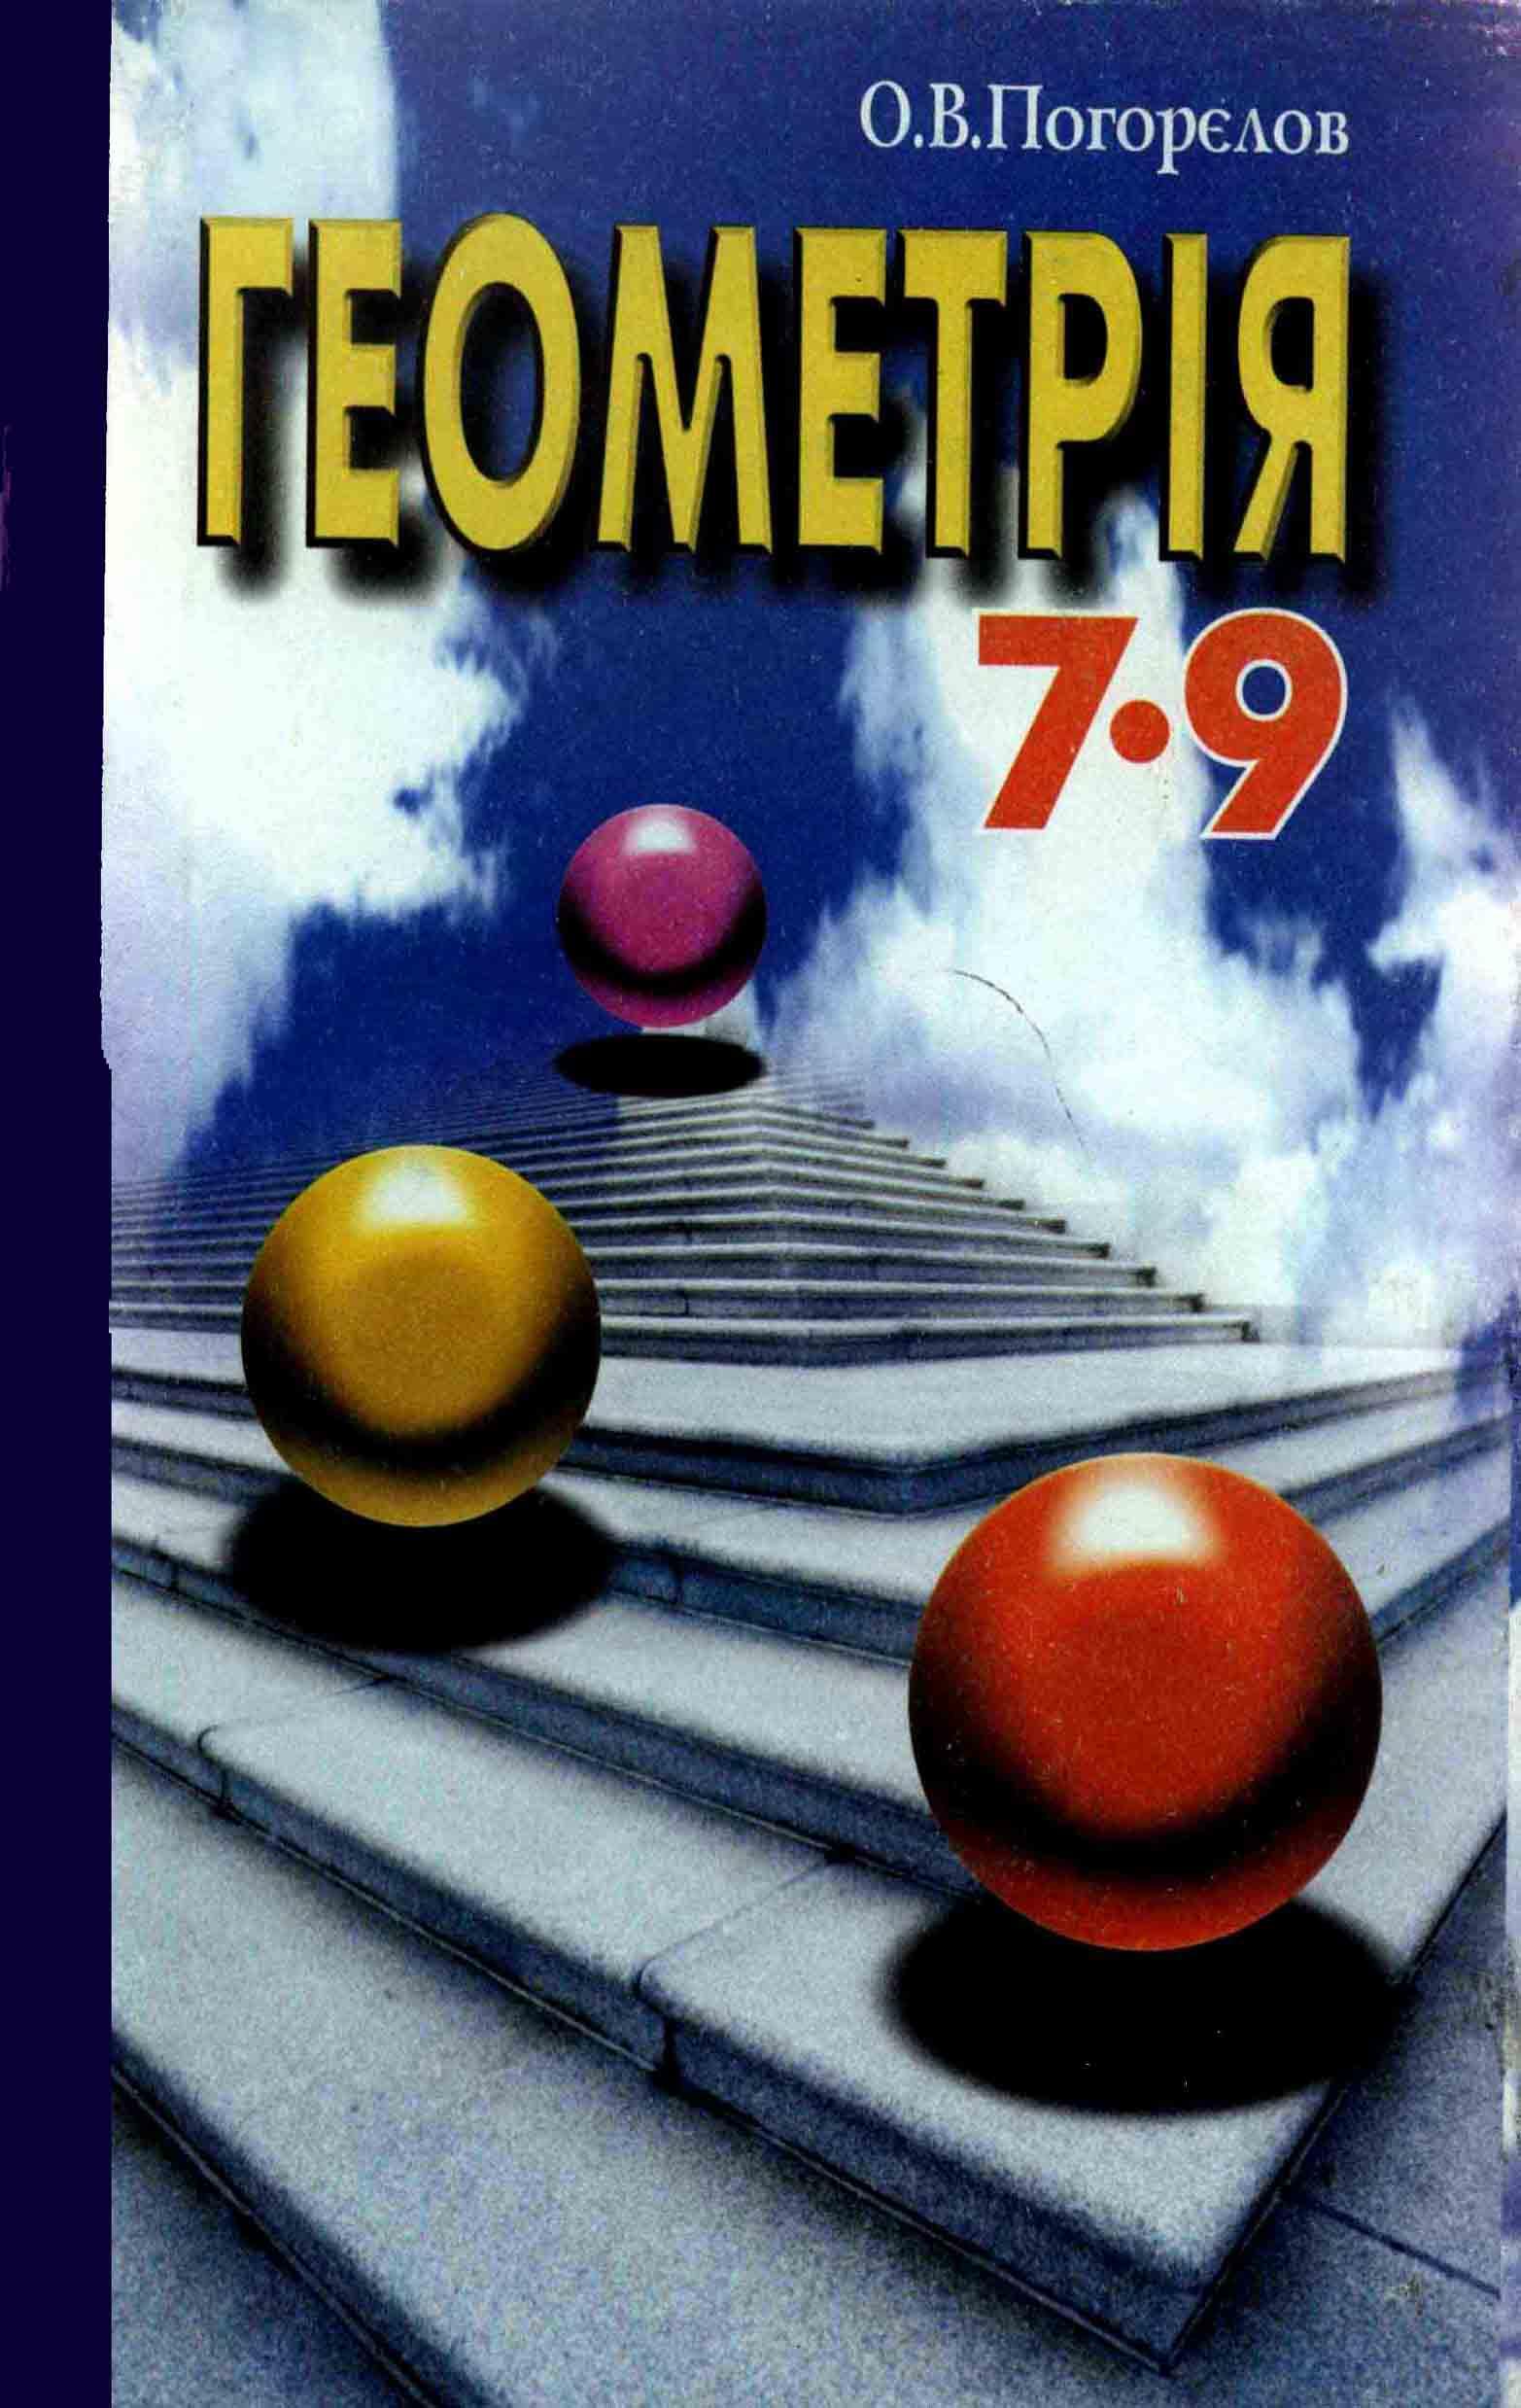 Геометрия 8 класс погорелов решебник